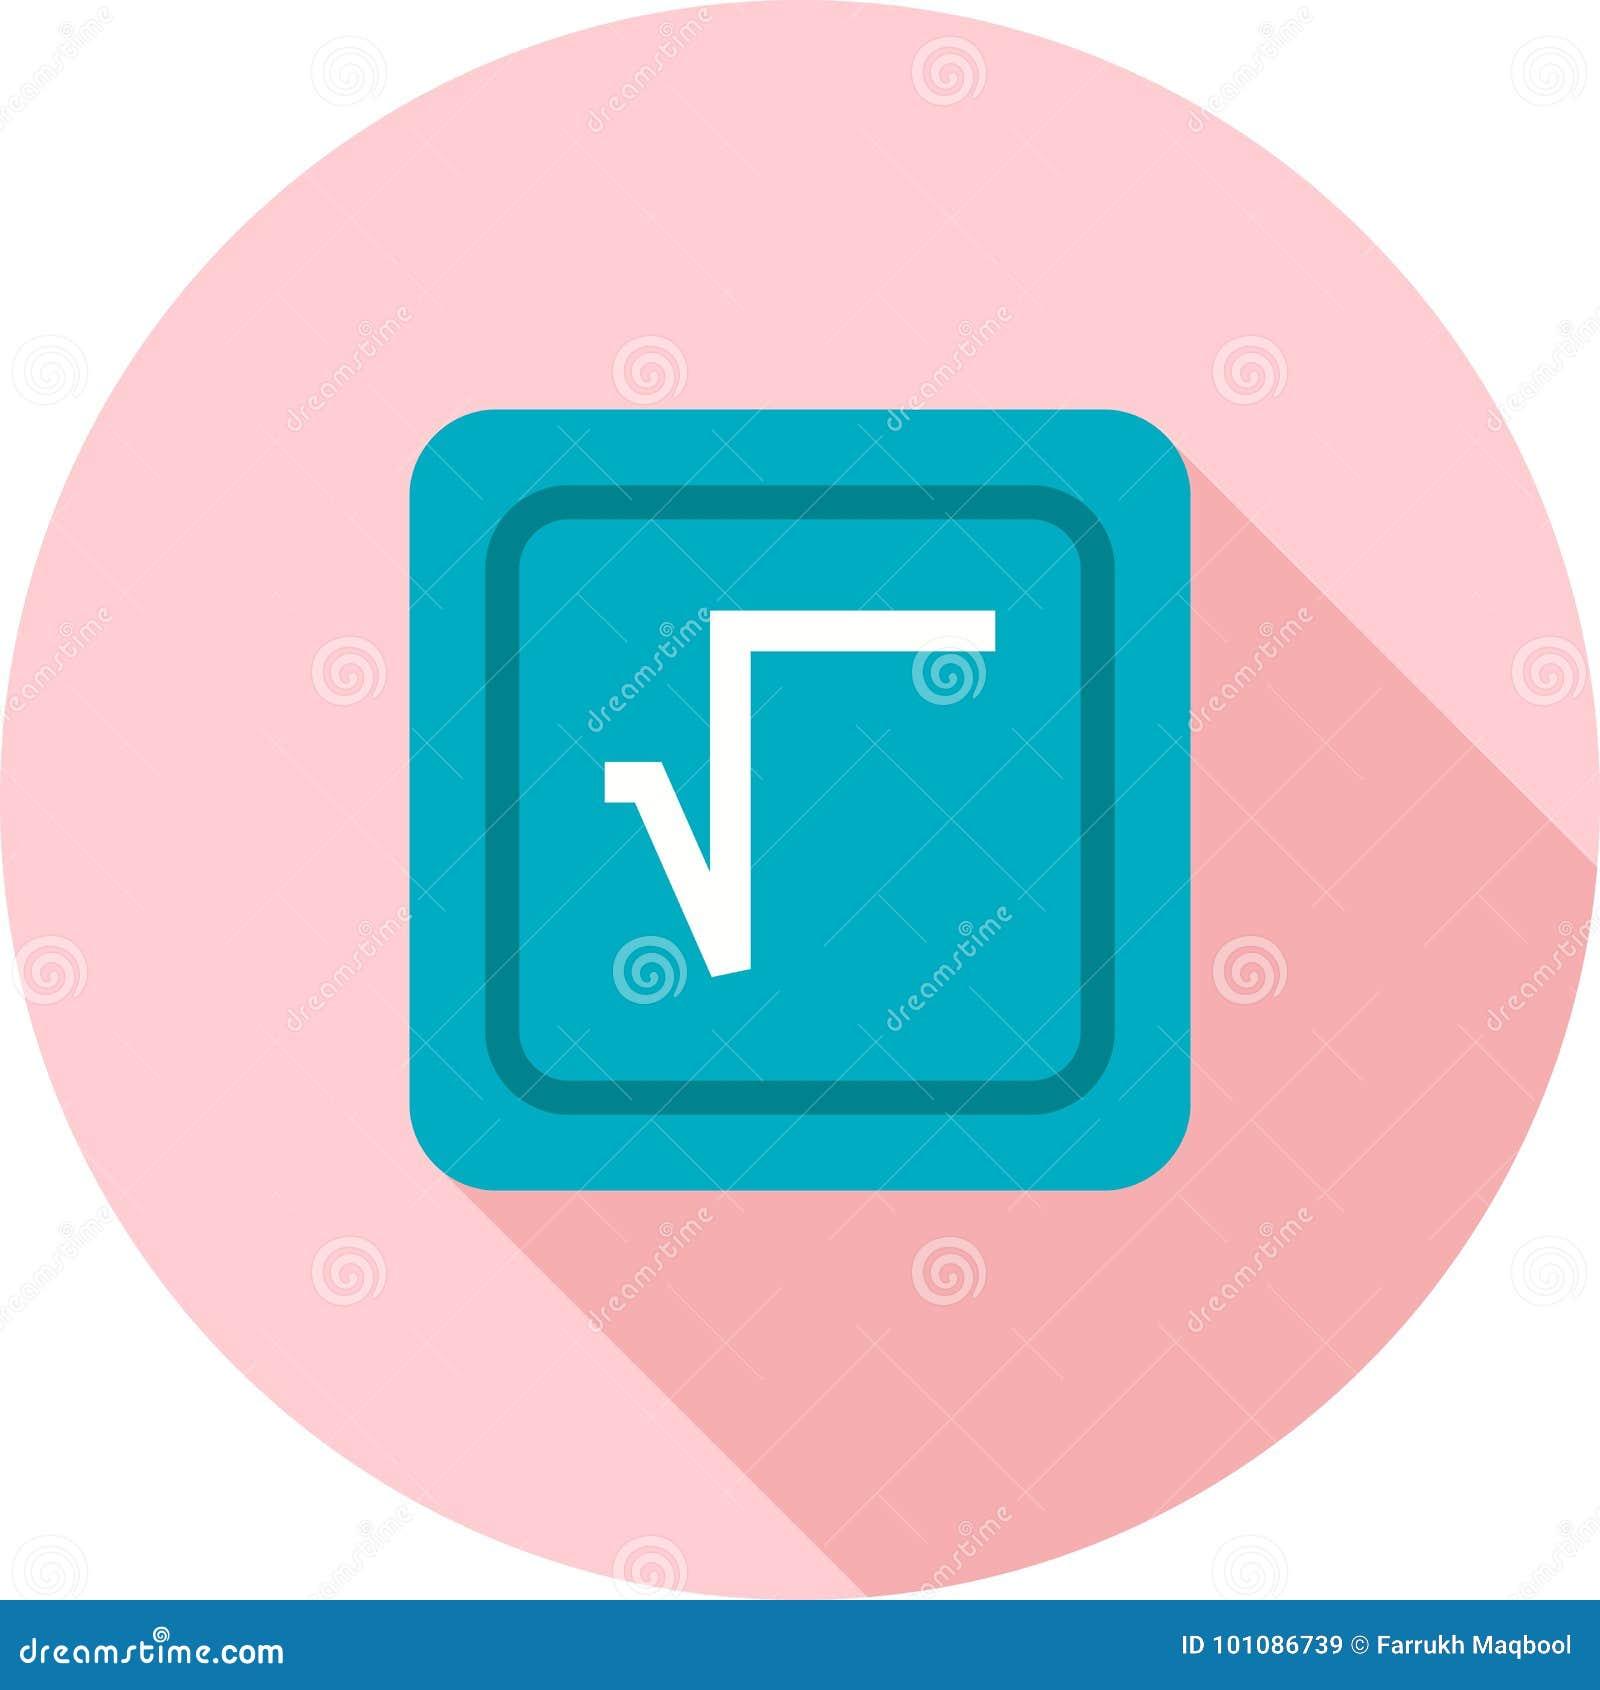 Square Root Symbol Stock Vector Illustration Of Mathematics 101086739